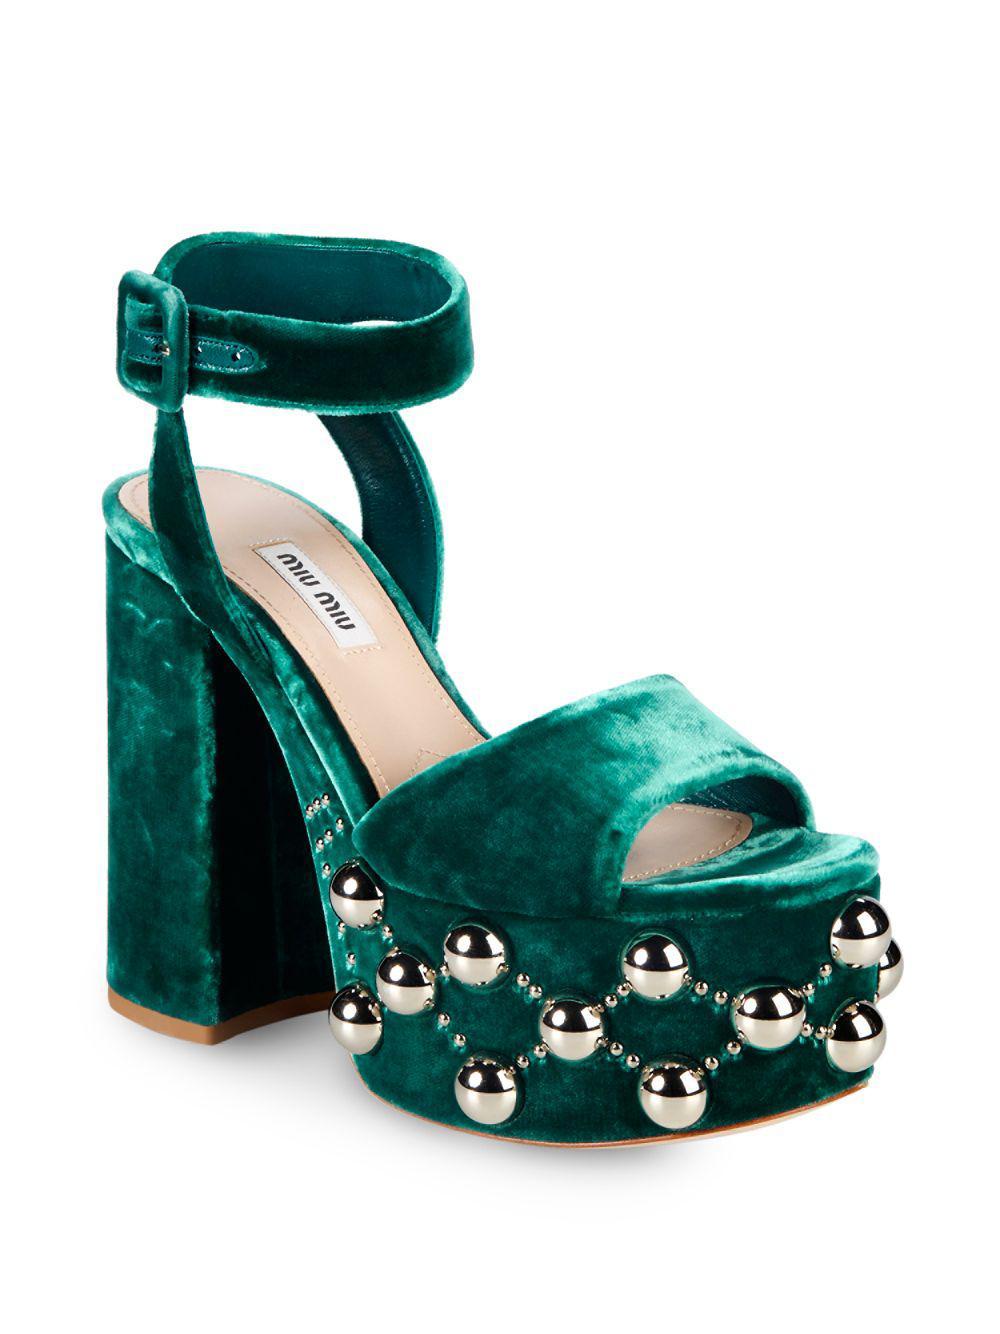 54991cf0468 Lyst - Miu Miu Velvet Sandals in Green